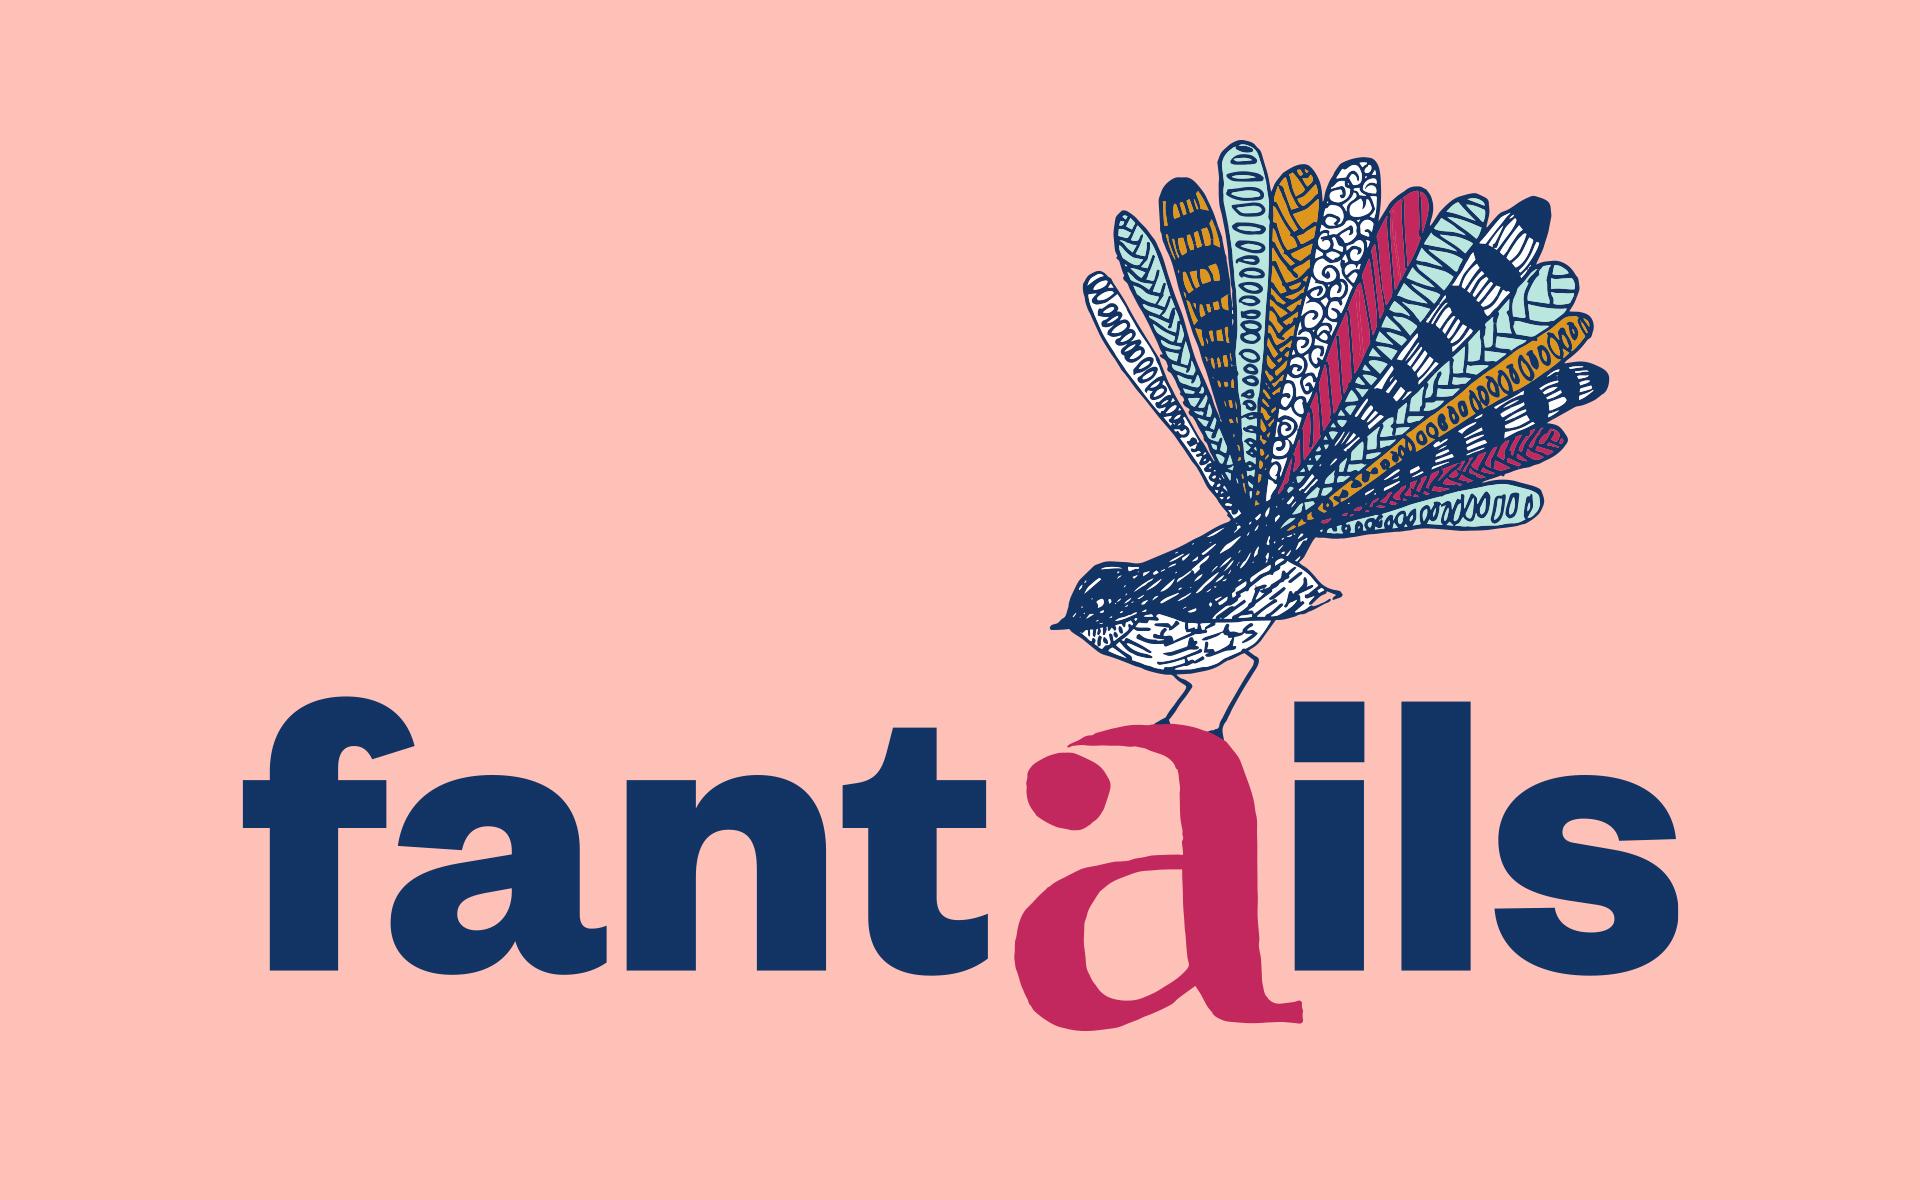 Fantails_1920x1200.jpg